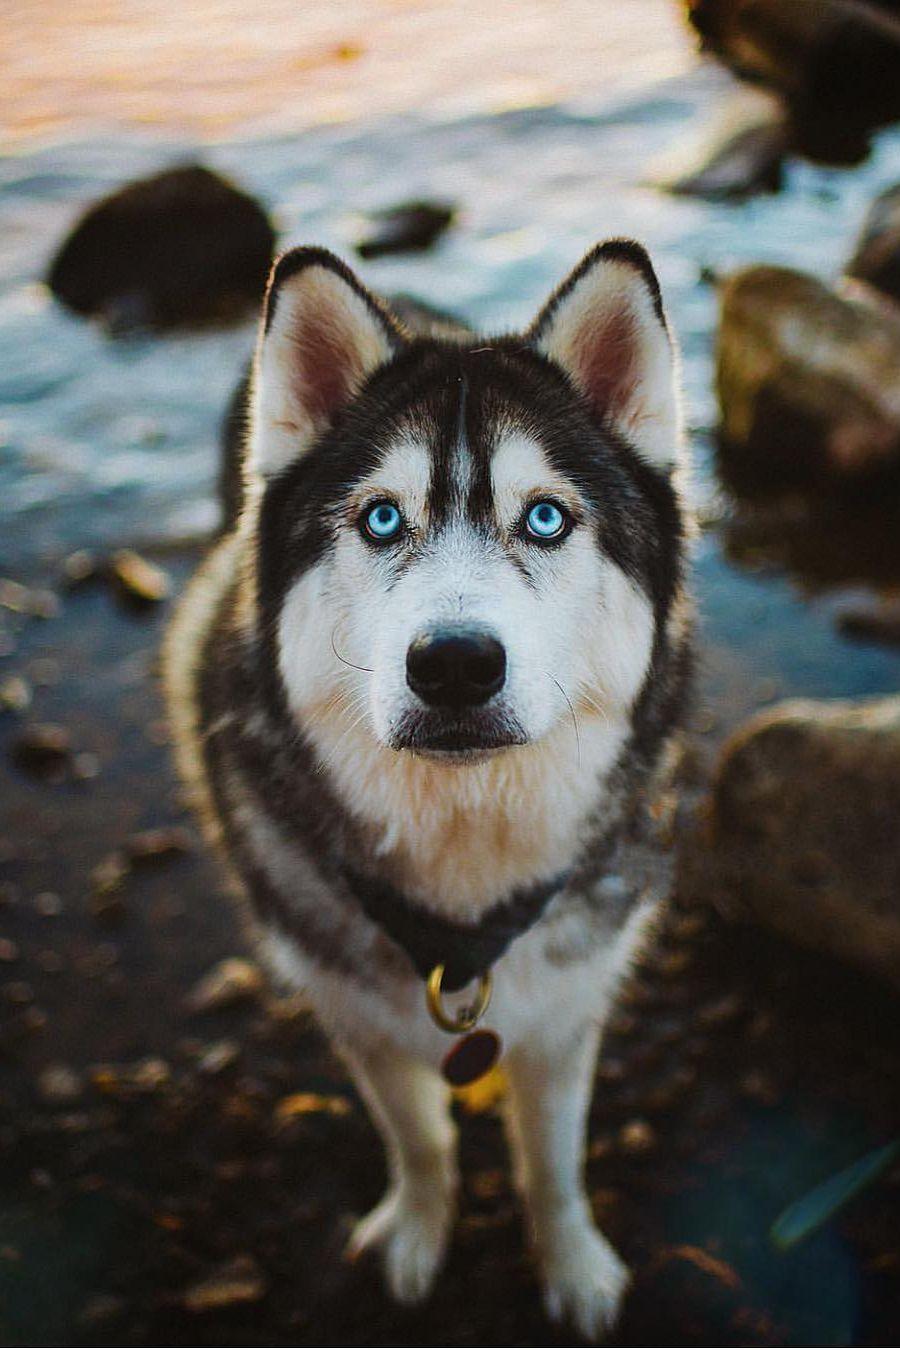 Dogs Zone Dogjokes Dogdayafternoon Doglice Huskies Dogs Blue